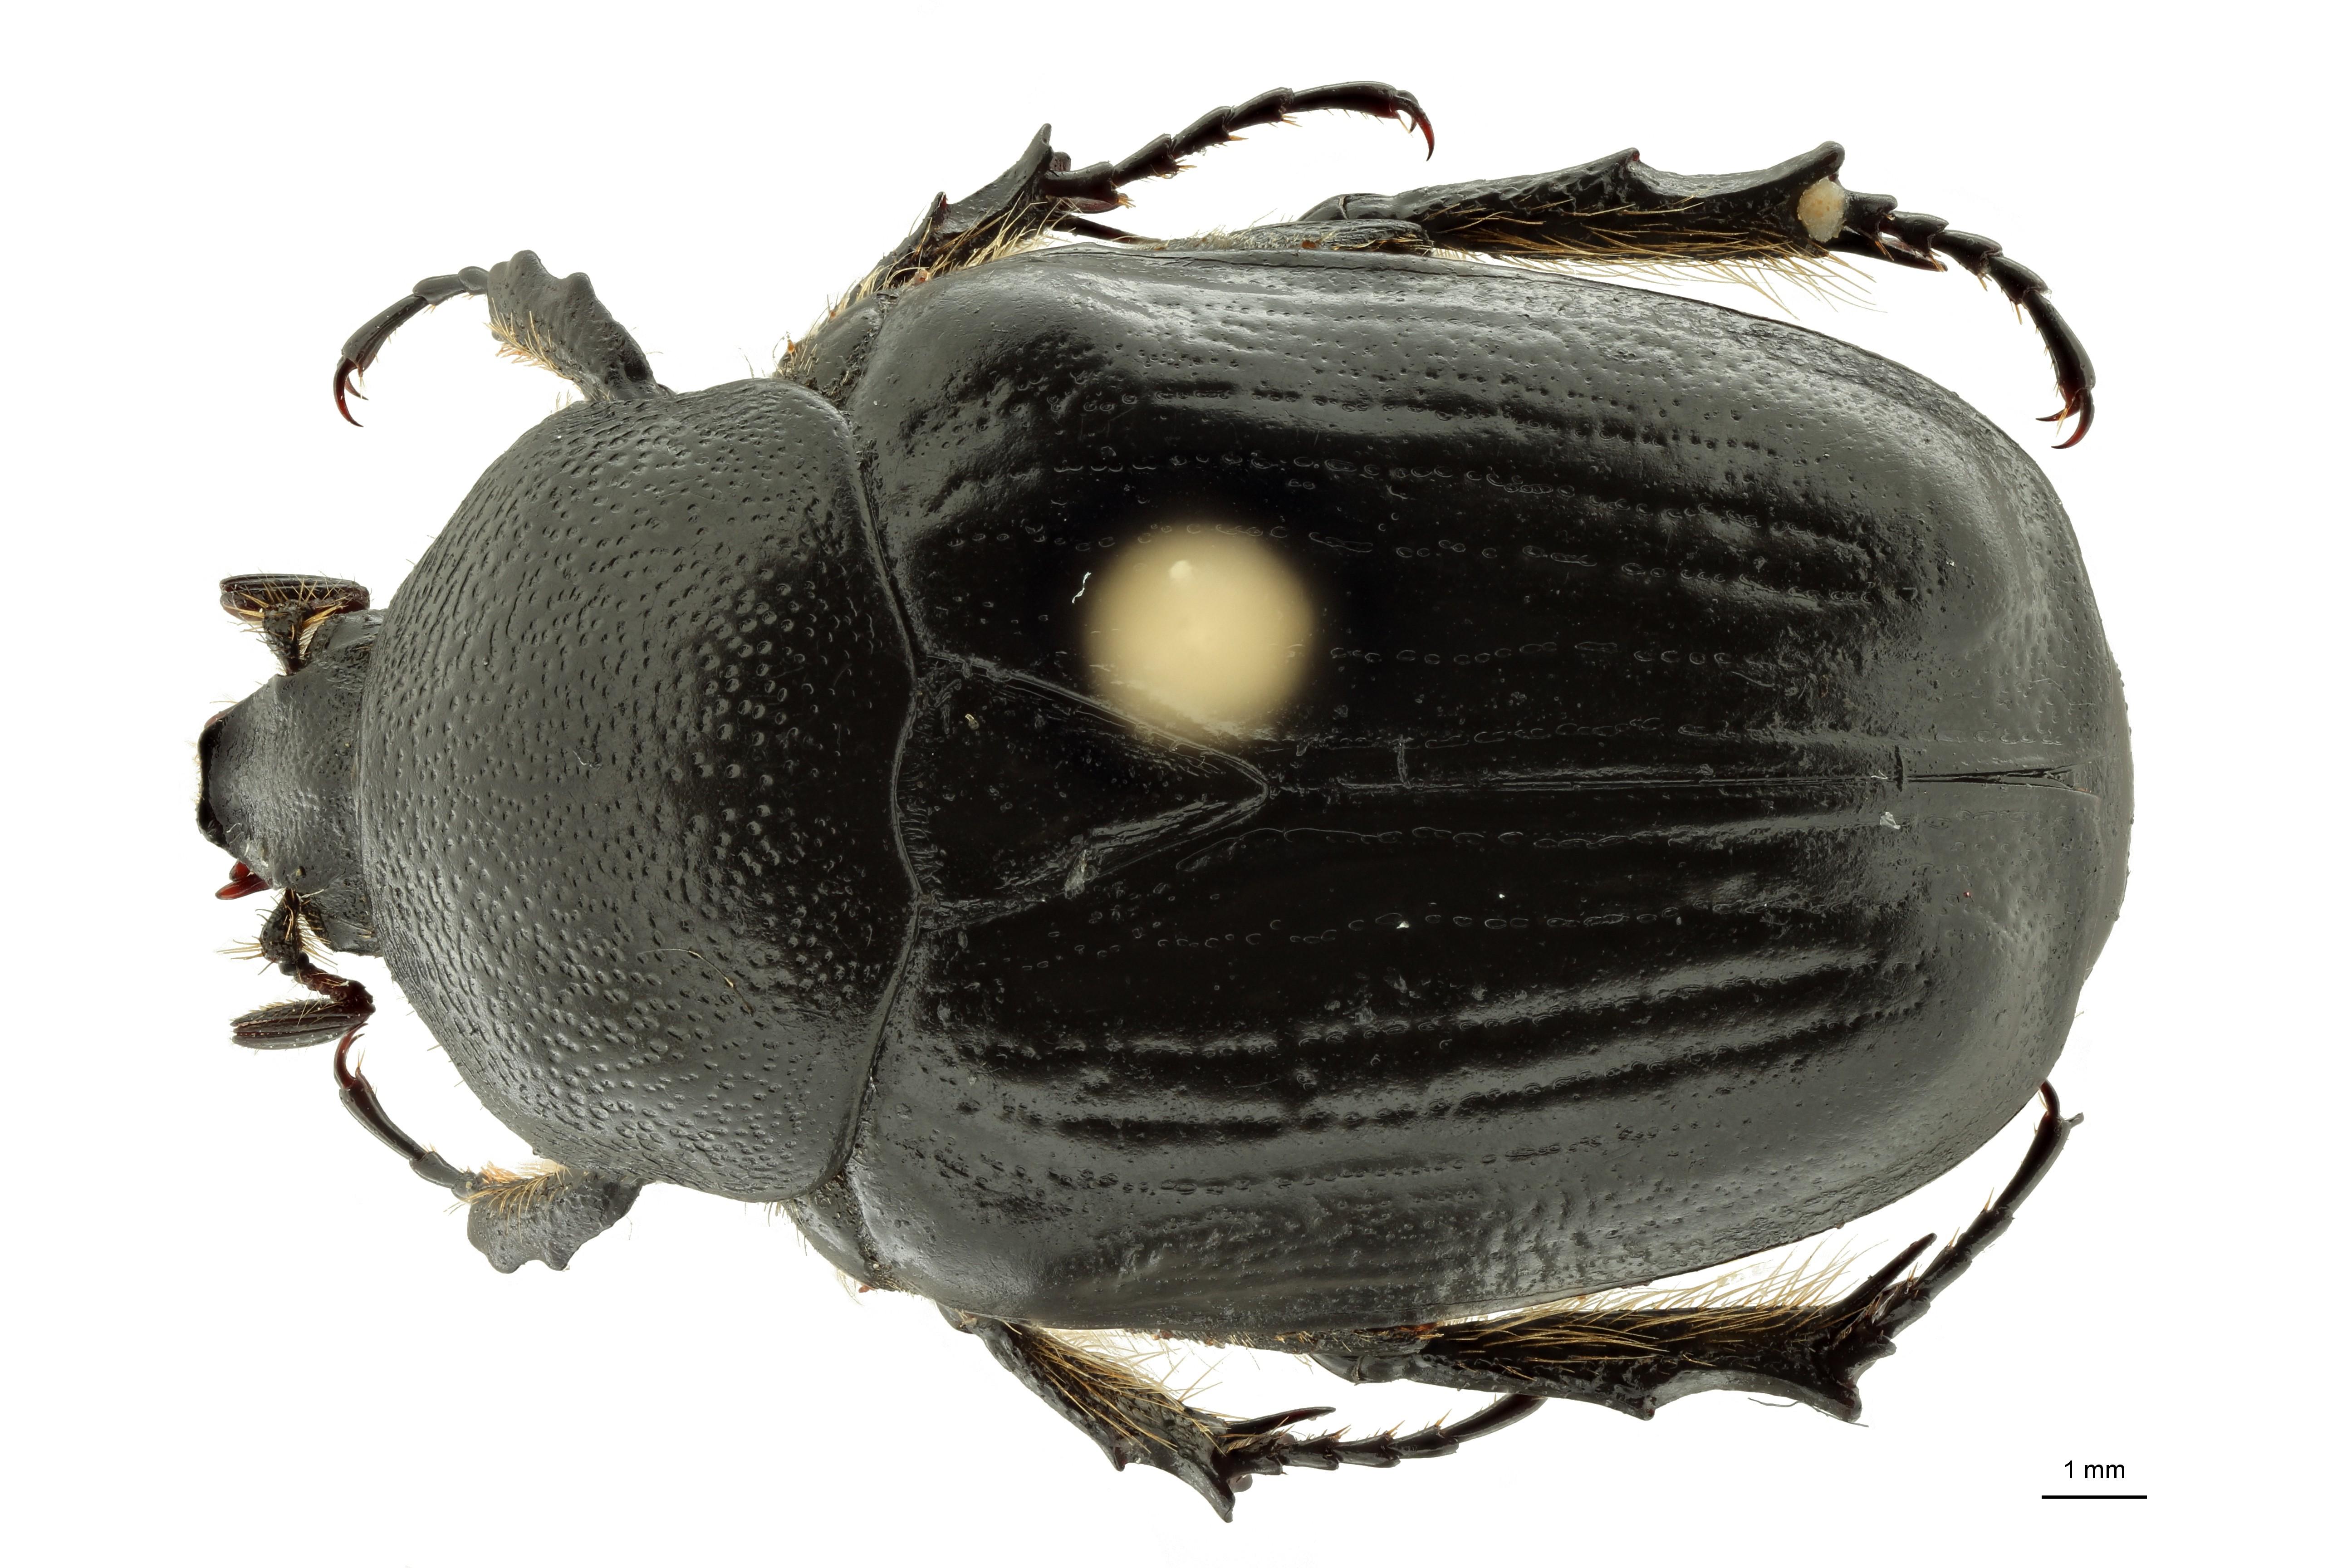 Anoplocheilus (Diplognathoides) werneri nt3 M D ZS PMax Scaled.jpeg